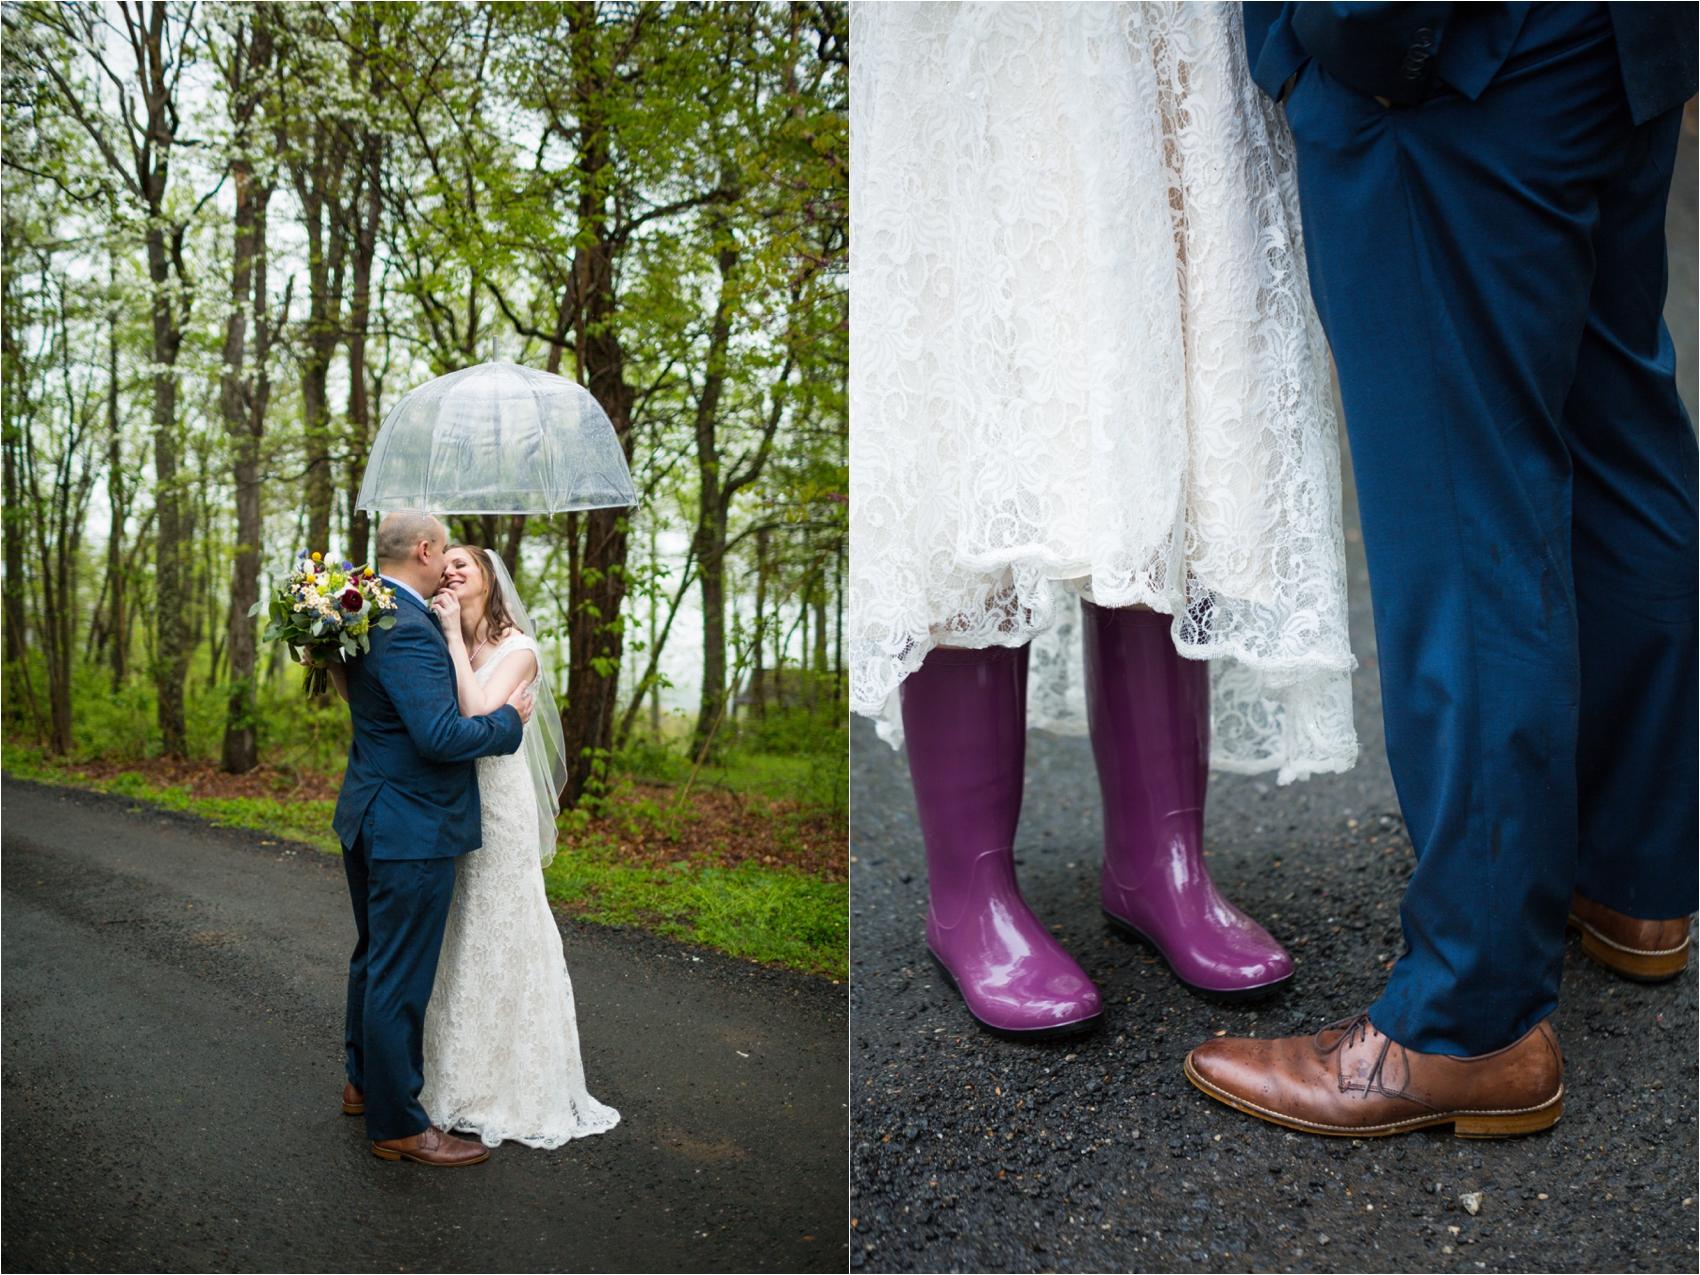 Lydia-Mountain-Spring-Virginia-Wedding-0408.jpg